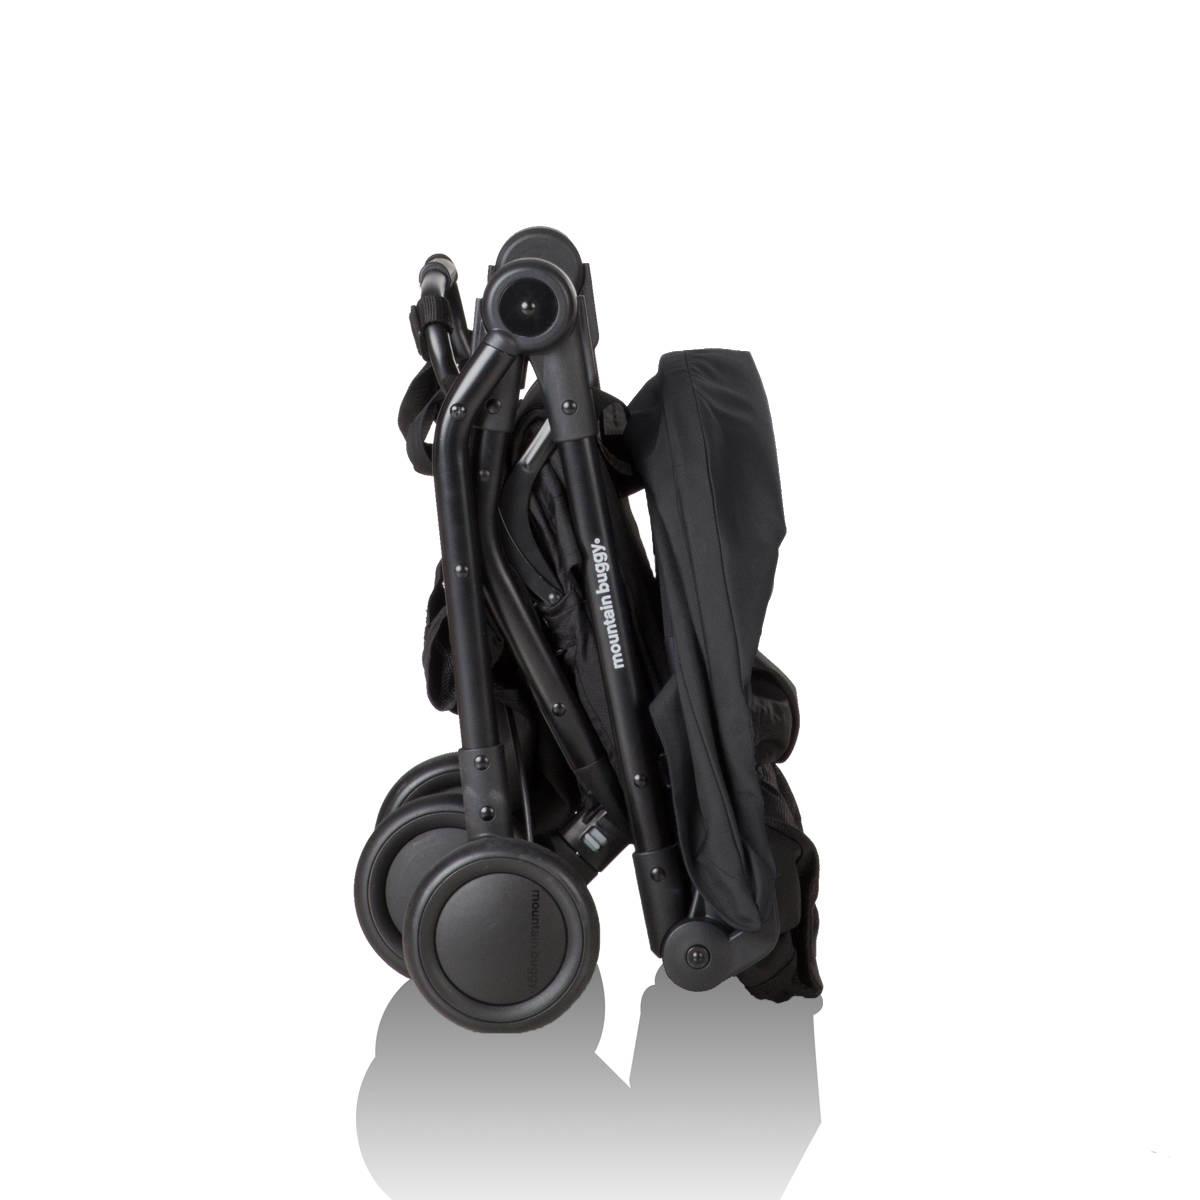 Mountain Buggy Nano V2 matkaratas - Matkarattaat - 4587778545 - 5